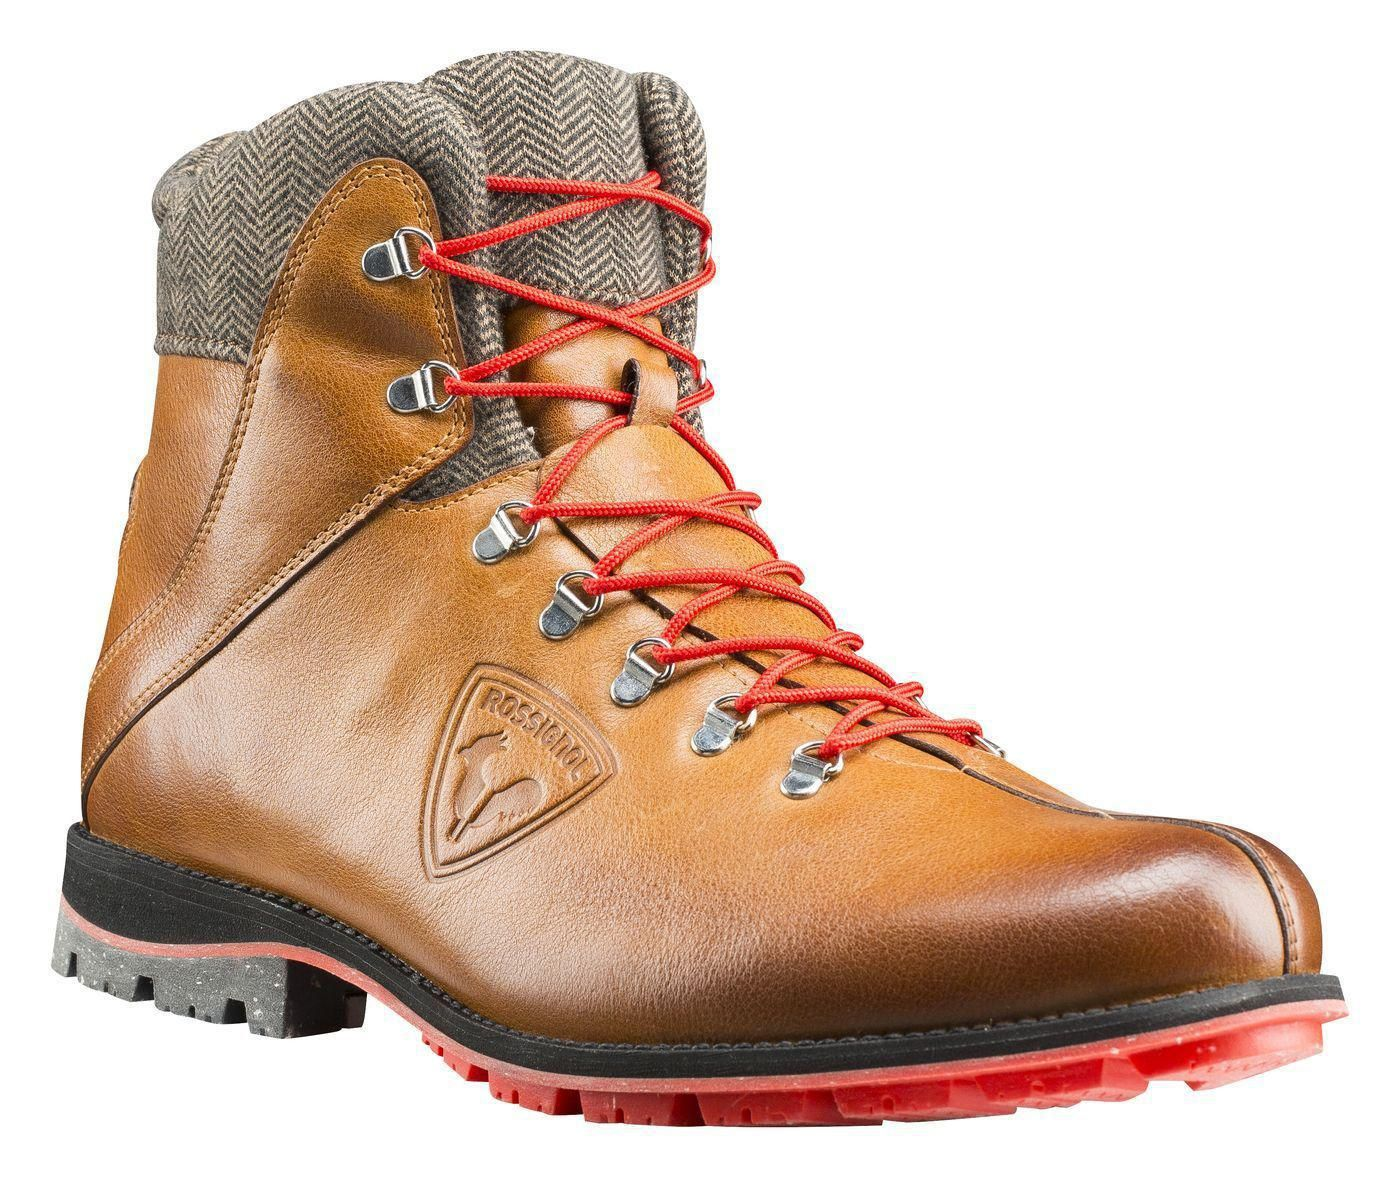 CHAMONIX LIGHT BROWN Rossignol | Chaussures pour hommes